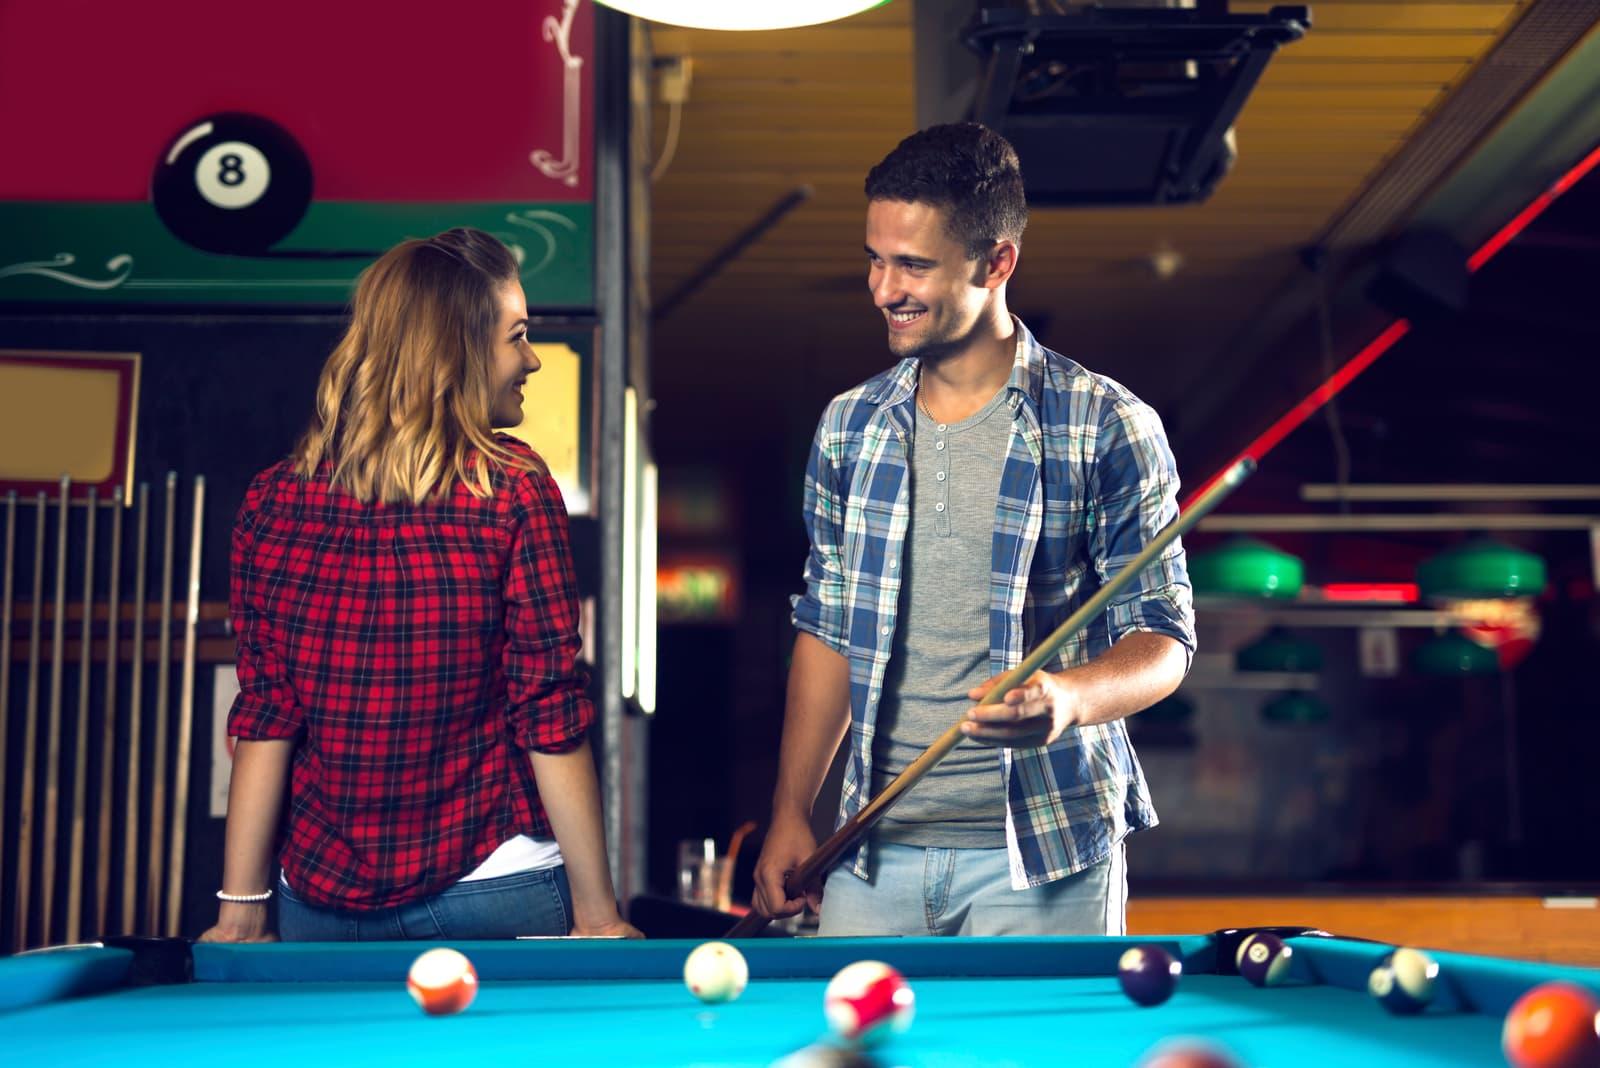 woman flirting with man in the billiar club